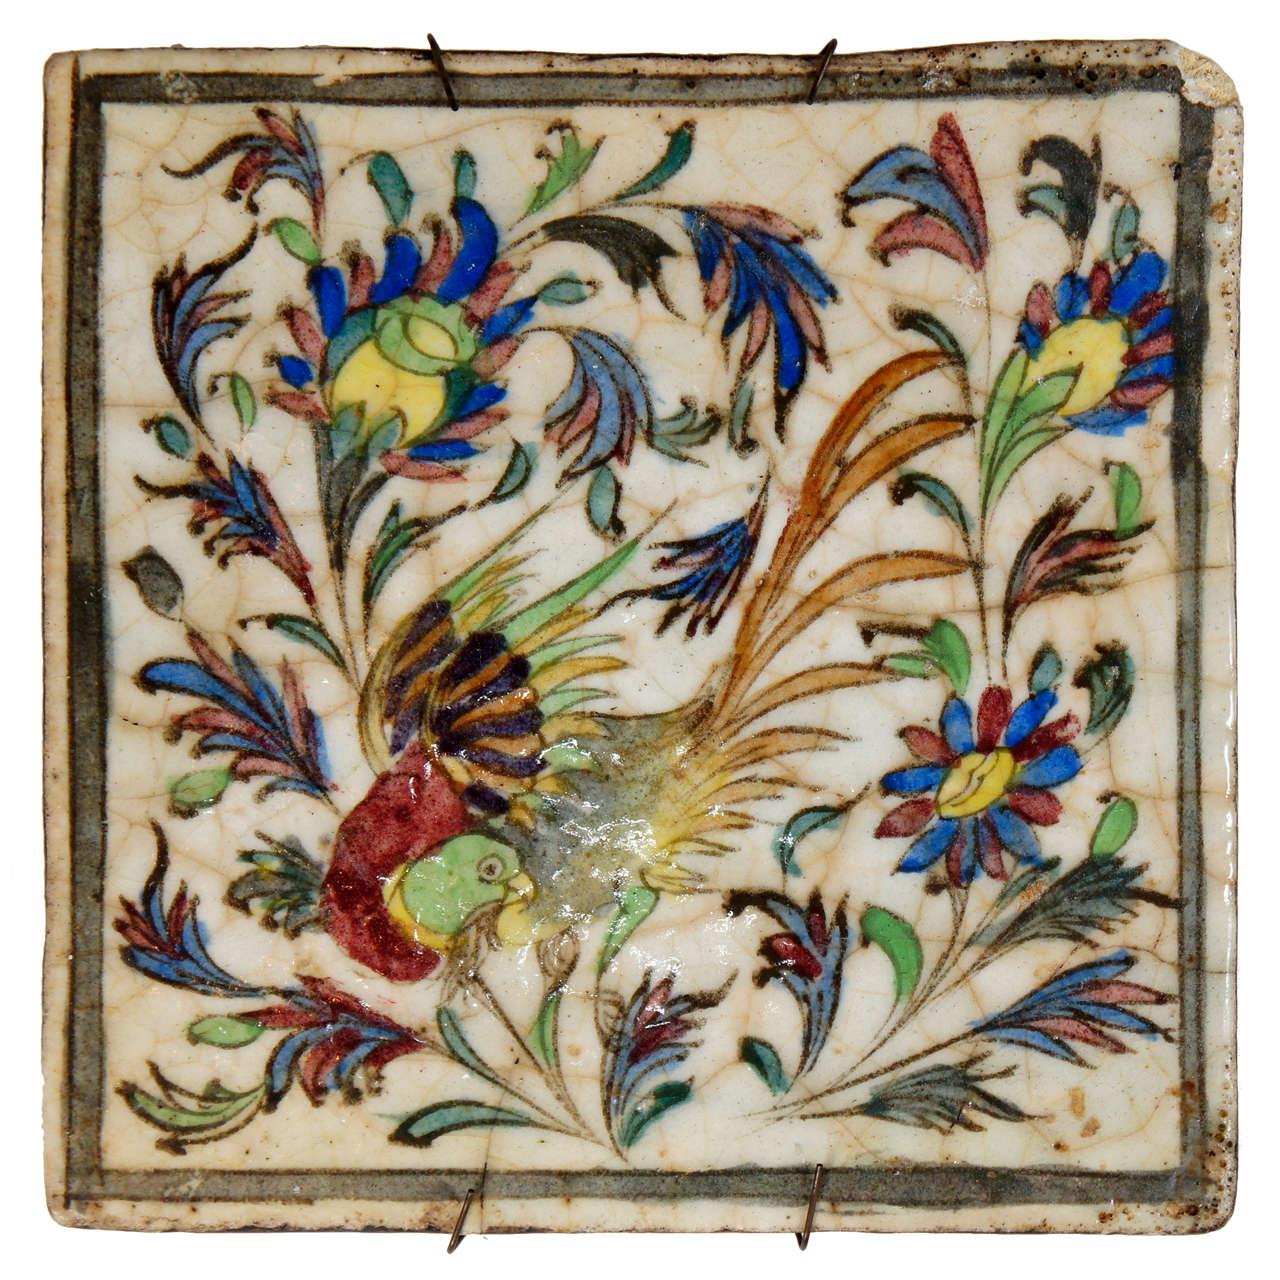 Persian Terra Cotta hand-painted Tile